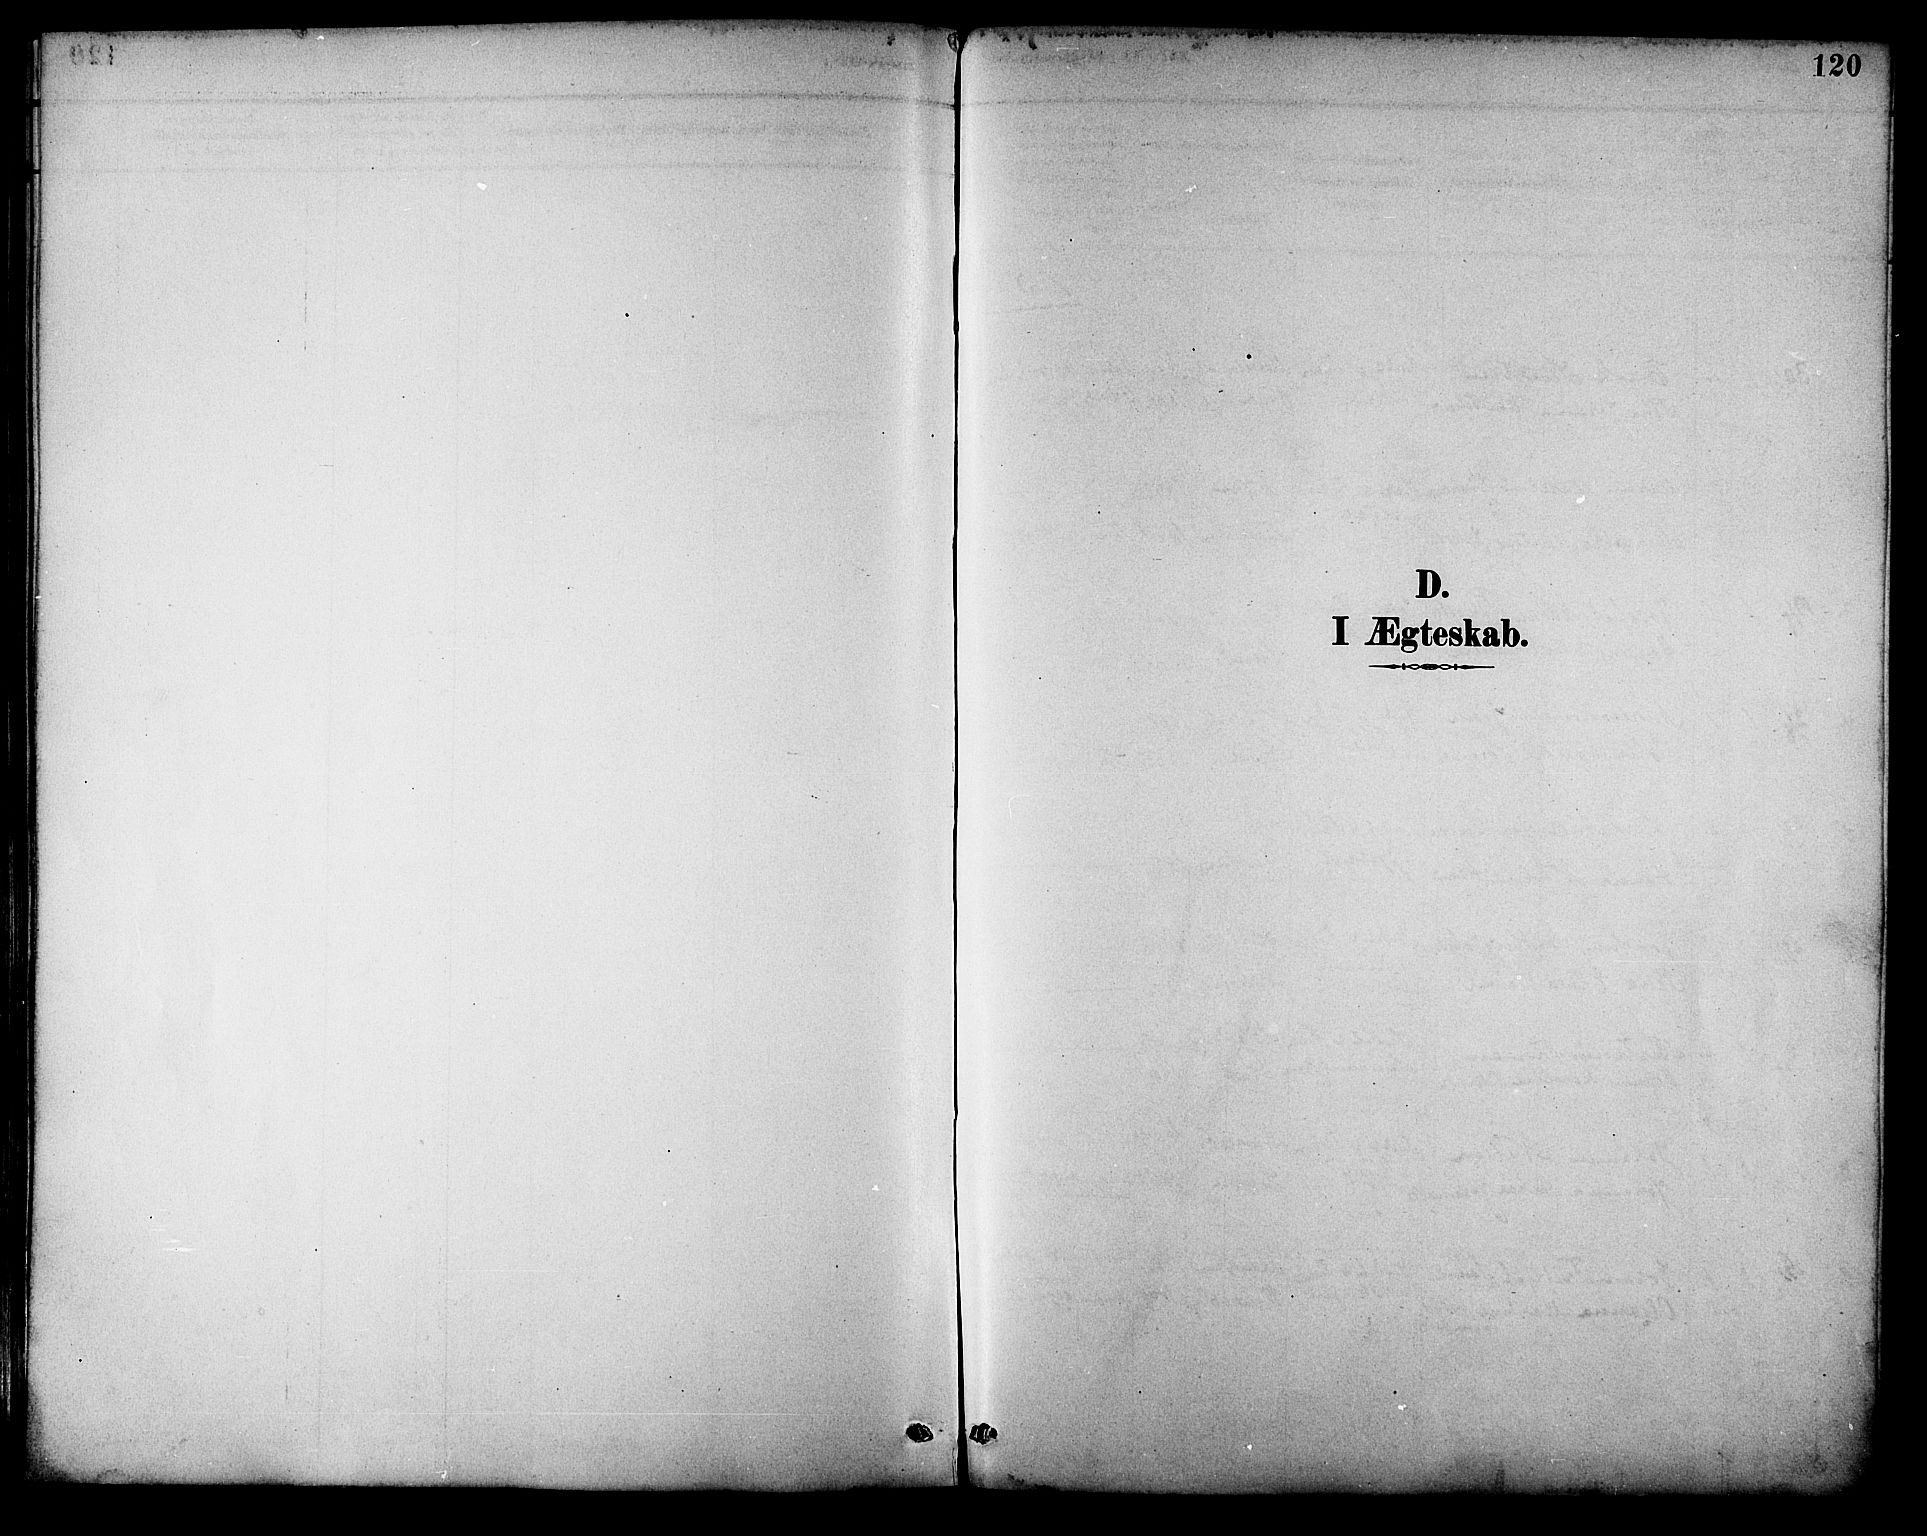 SAT, Ministerialprotokoller, klokkerbøker og fødselsregistre - Nordland, 892/L1320: Ministerialbok nr. 892A01, 1886-1901, s. 120